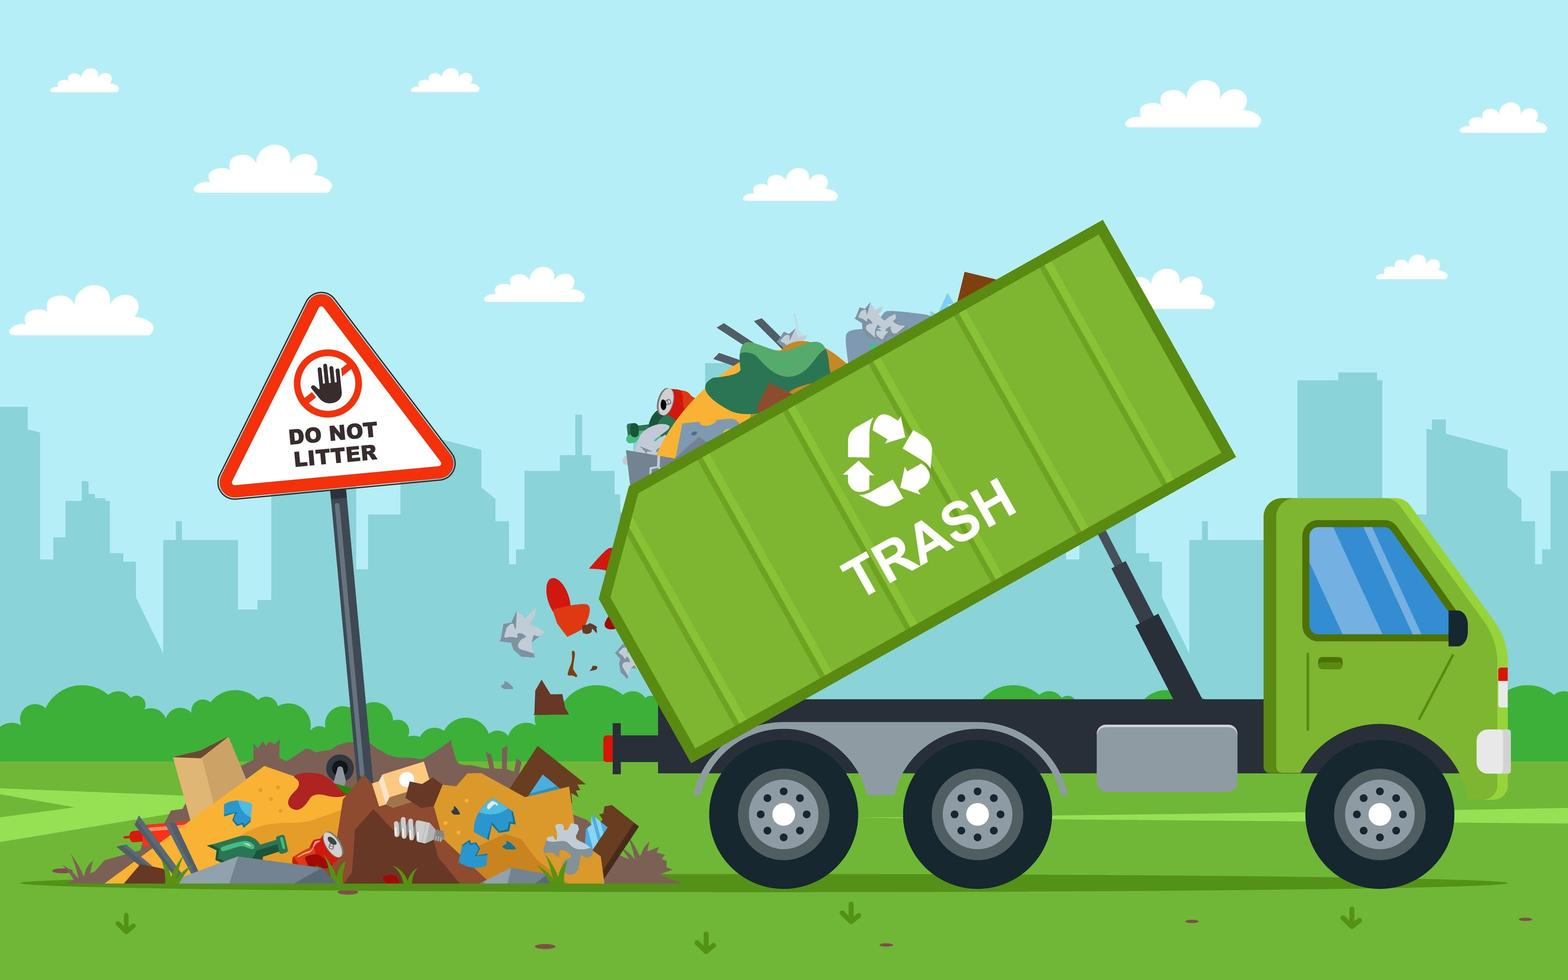 Drump truck illegal unloading waste into field vector